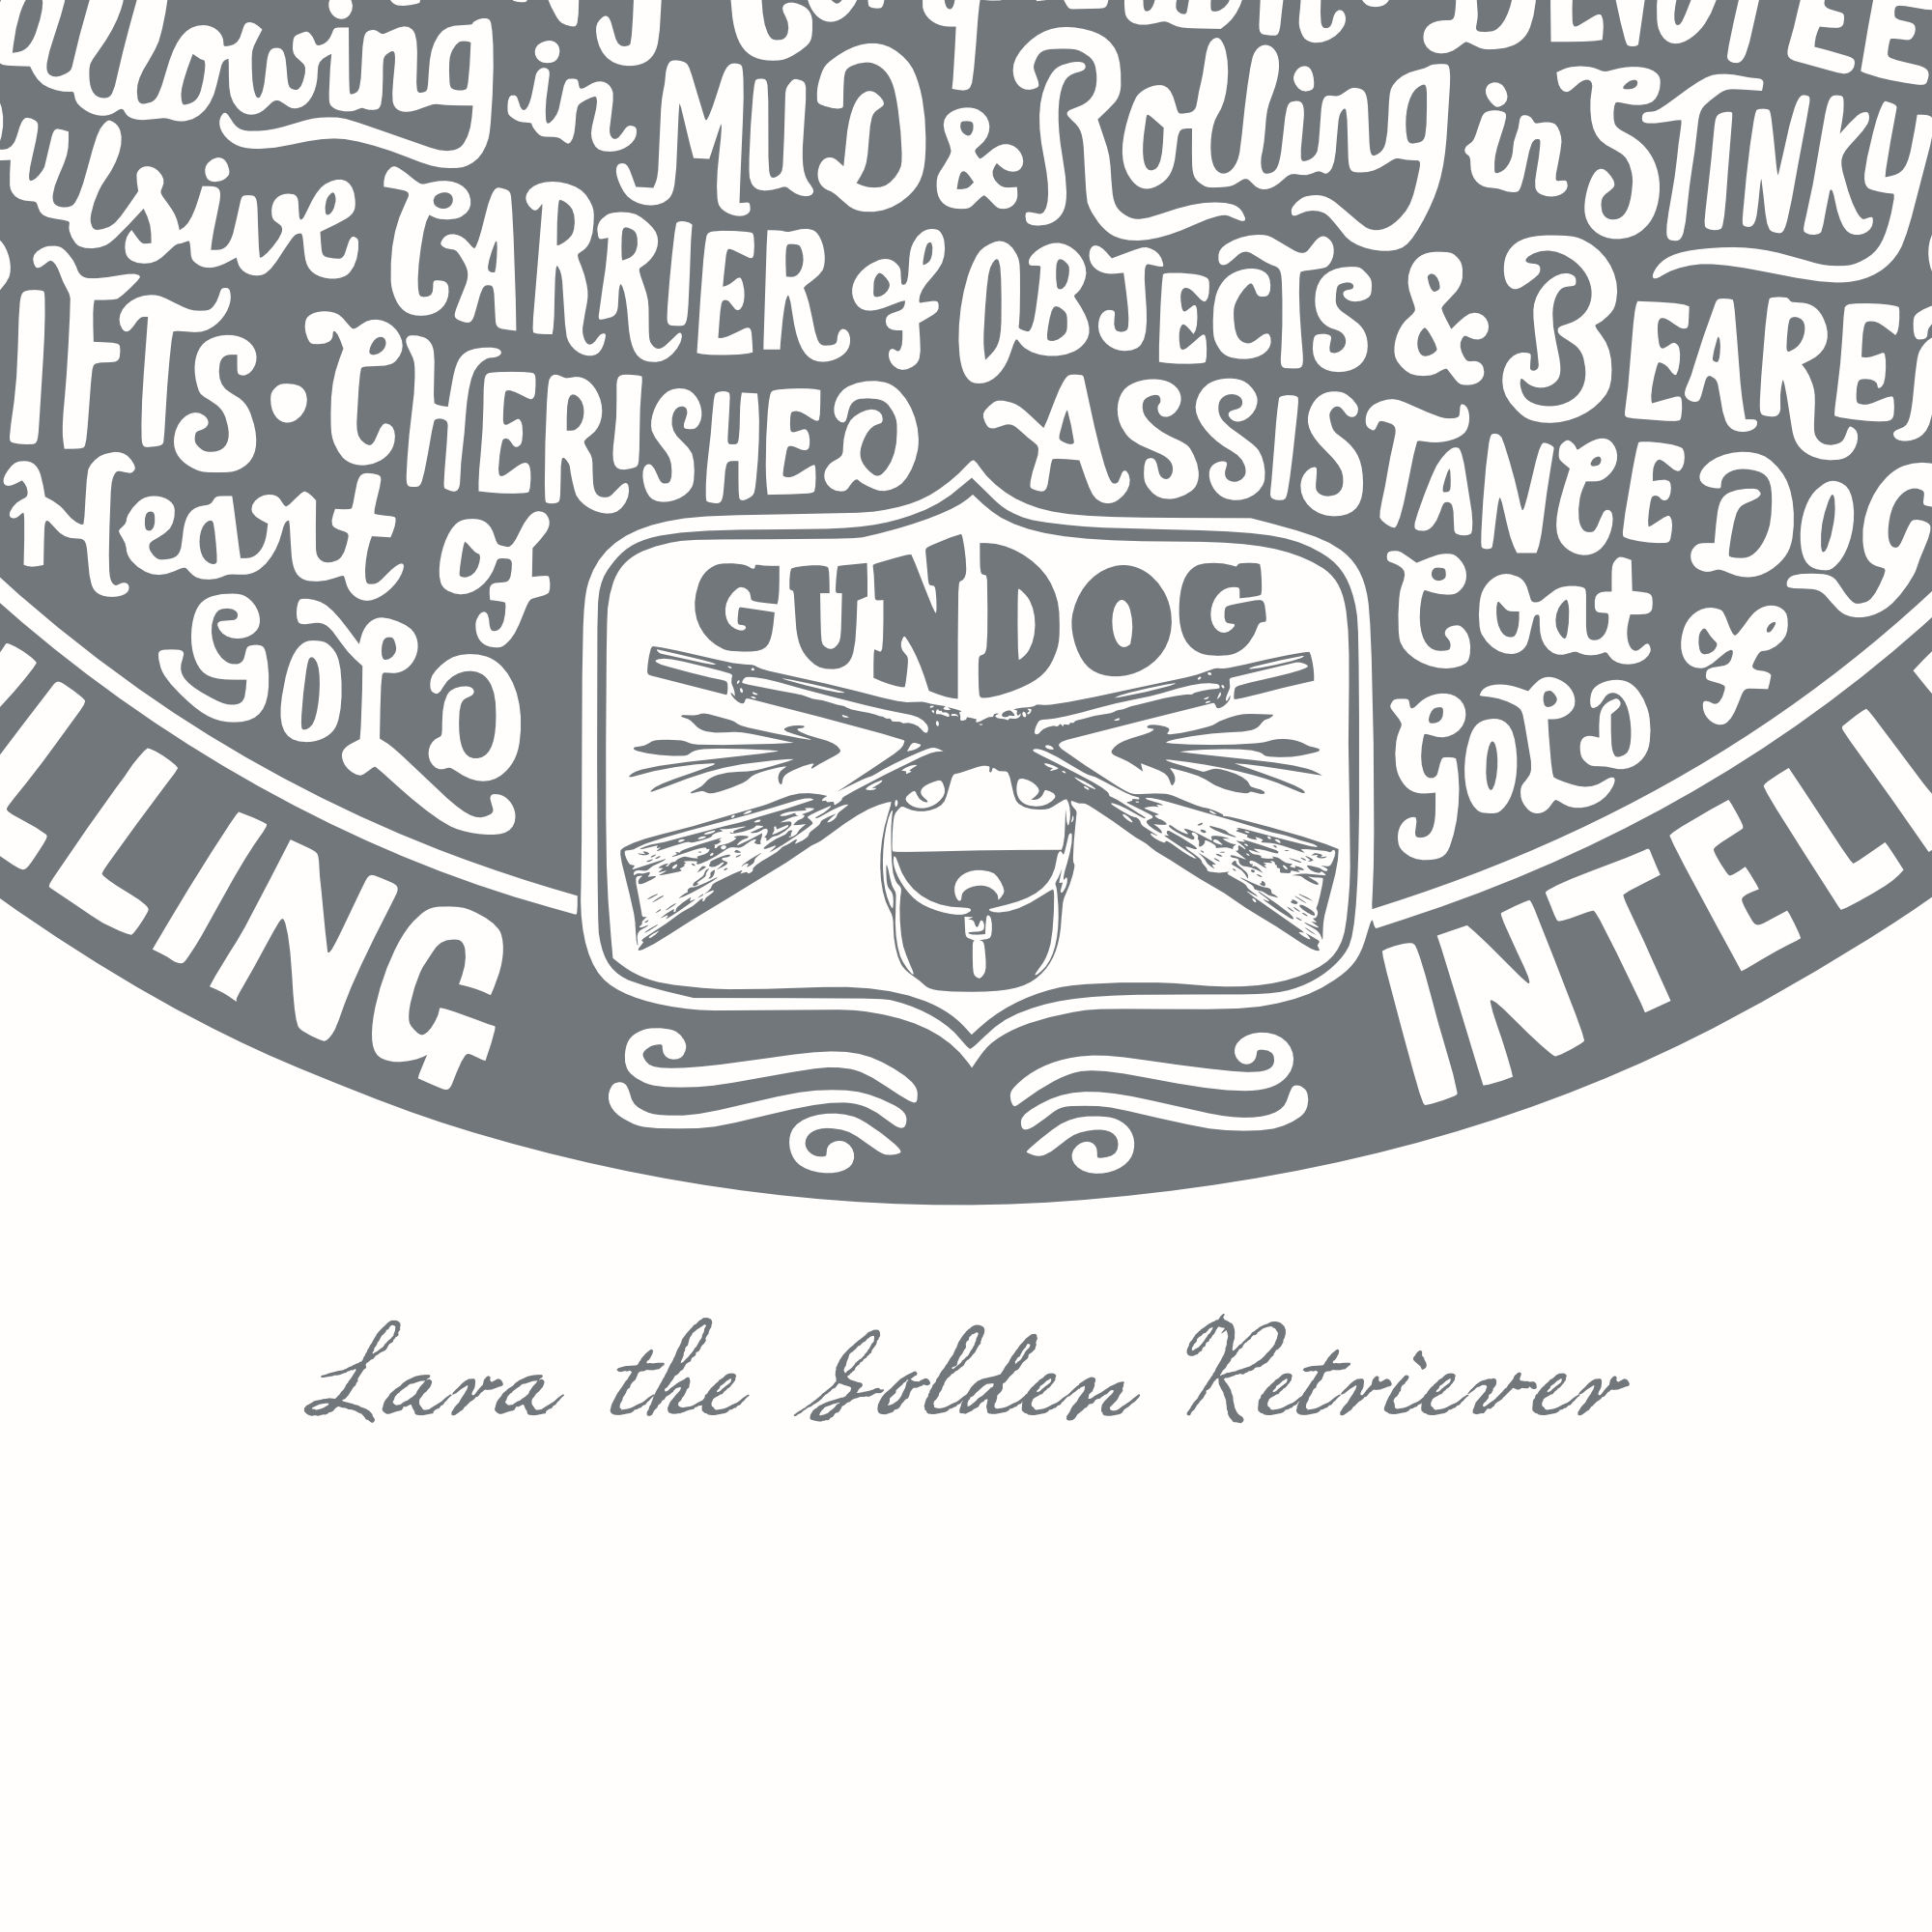 Personalised Golden Retriever Print | The Enlightened Hound